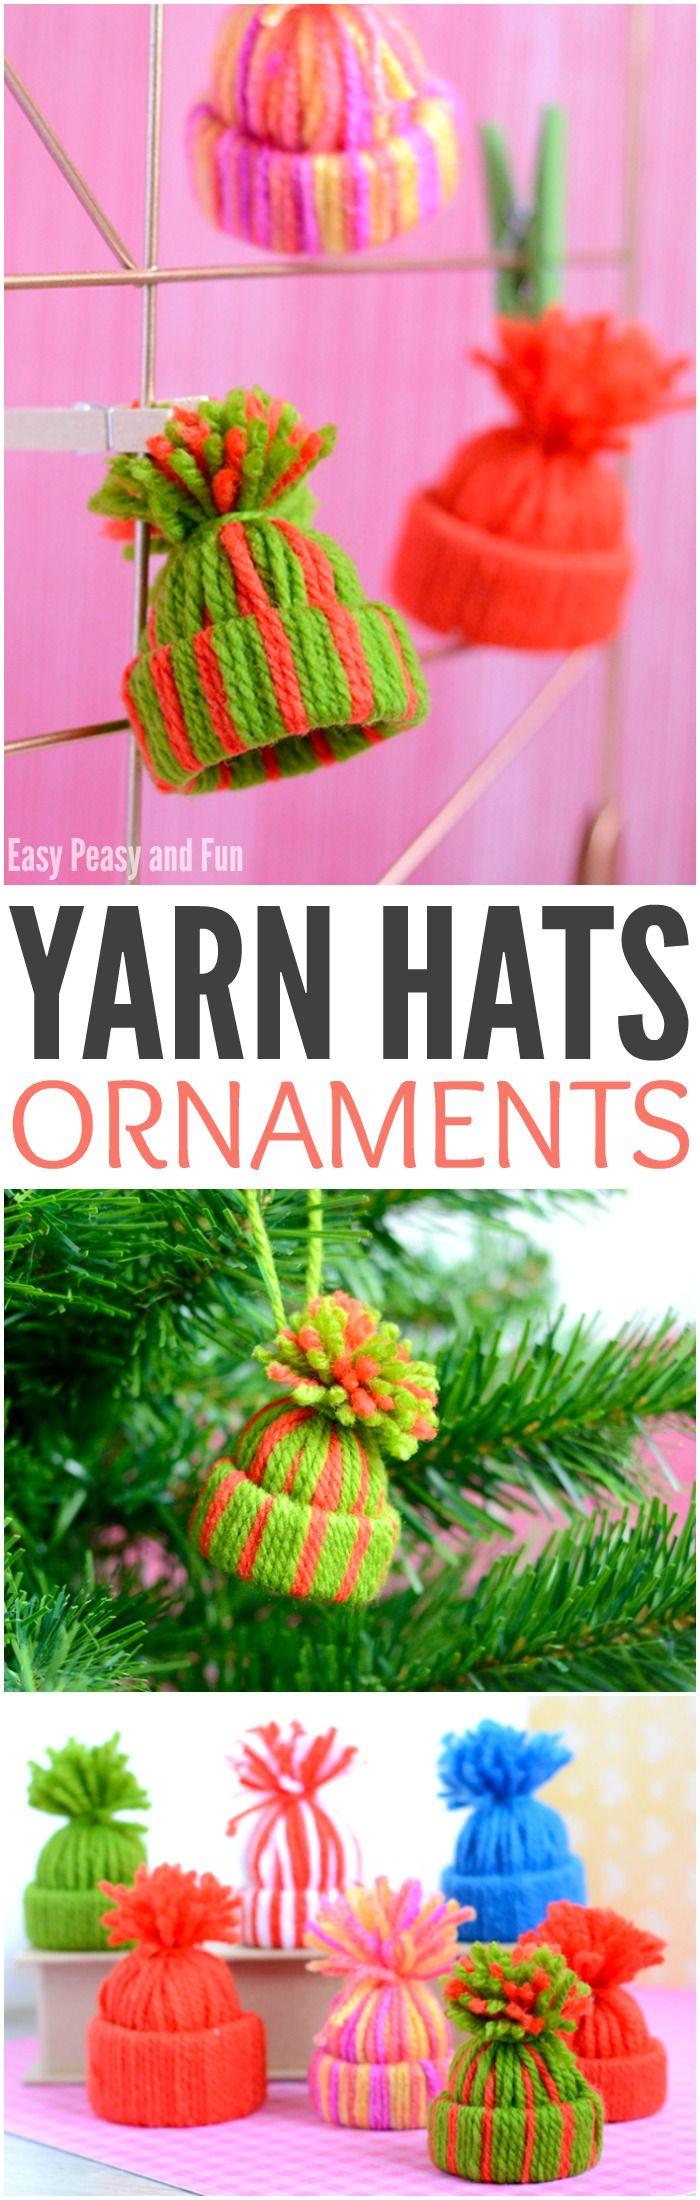 Mini yarn hats ornaments diy christmas ornaments navidad mini yarn hats ornaments diy christmas ornaments easy peasy and fun solutioingenieria Gallery